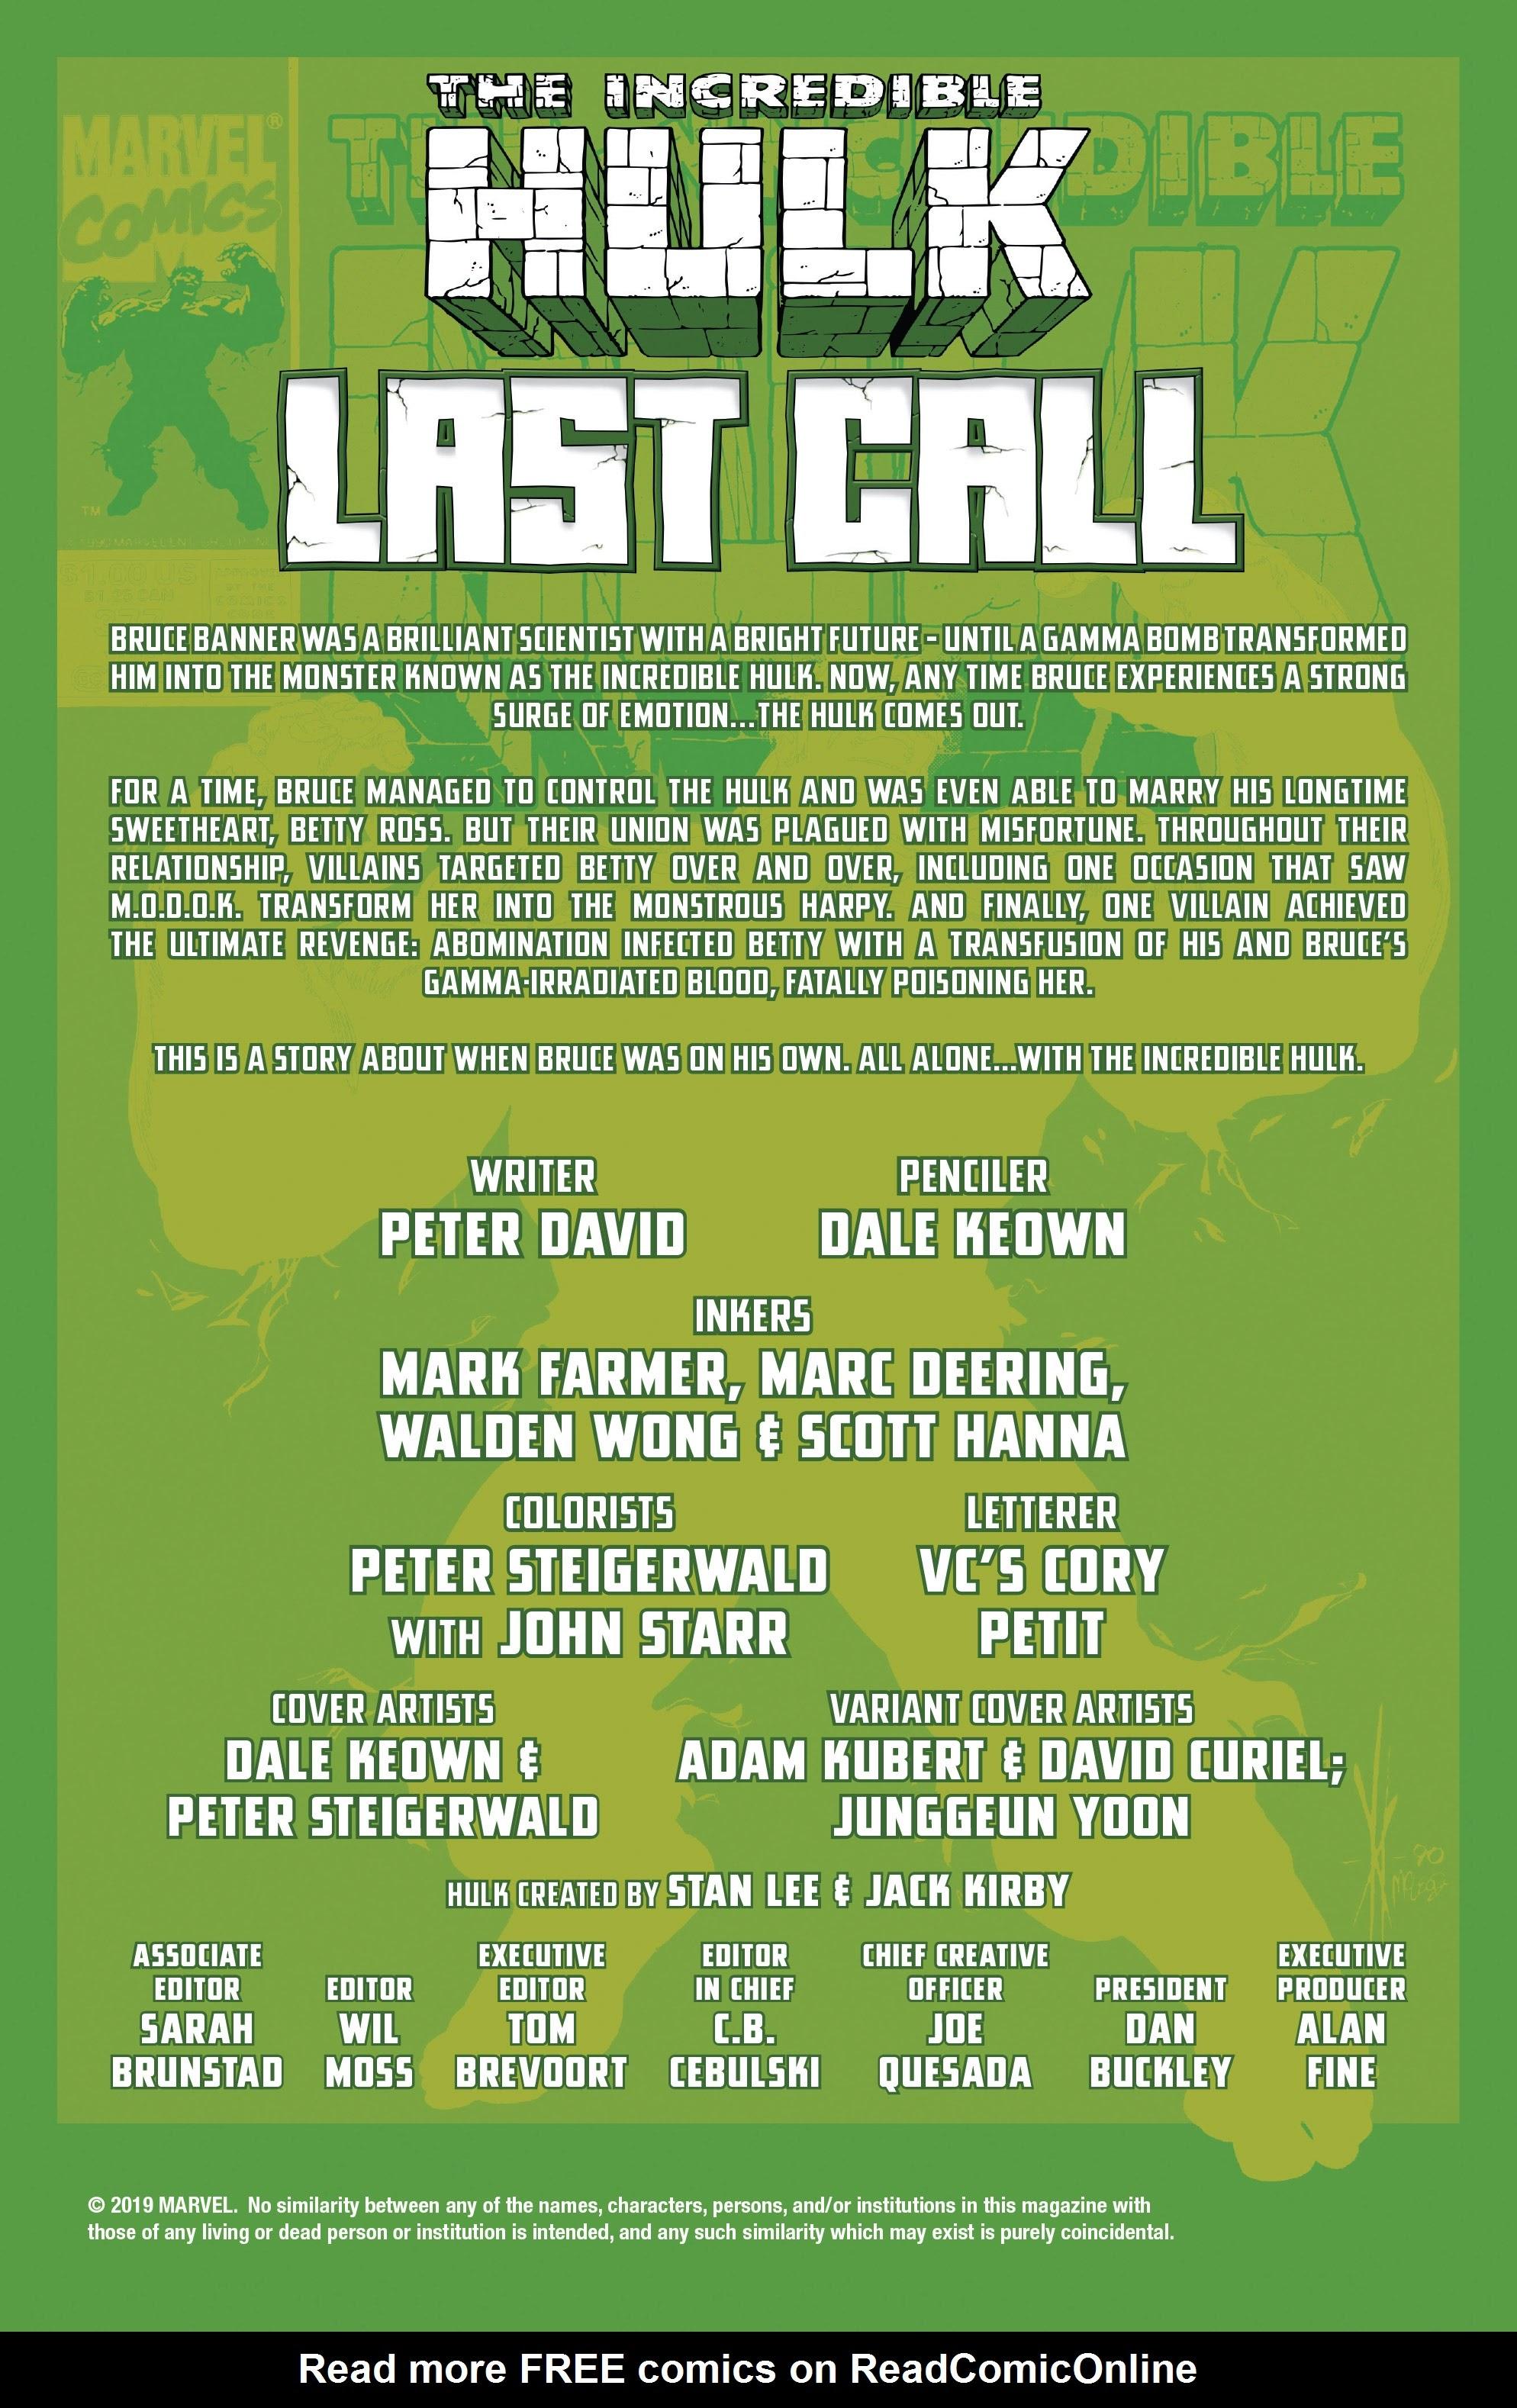 Incredible Hulk: Last Call Full Page 2